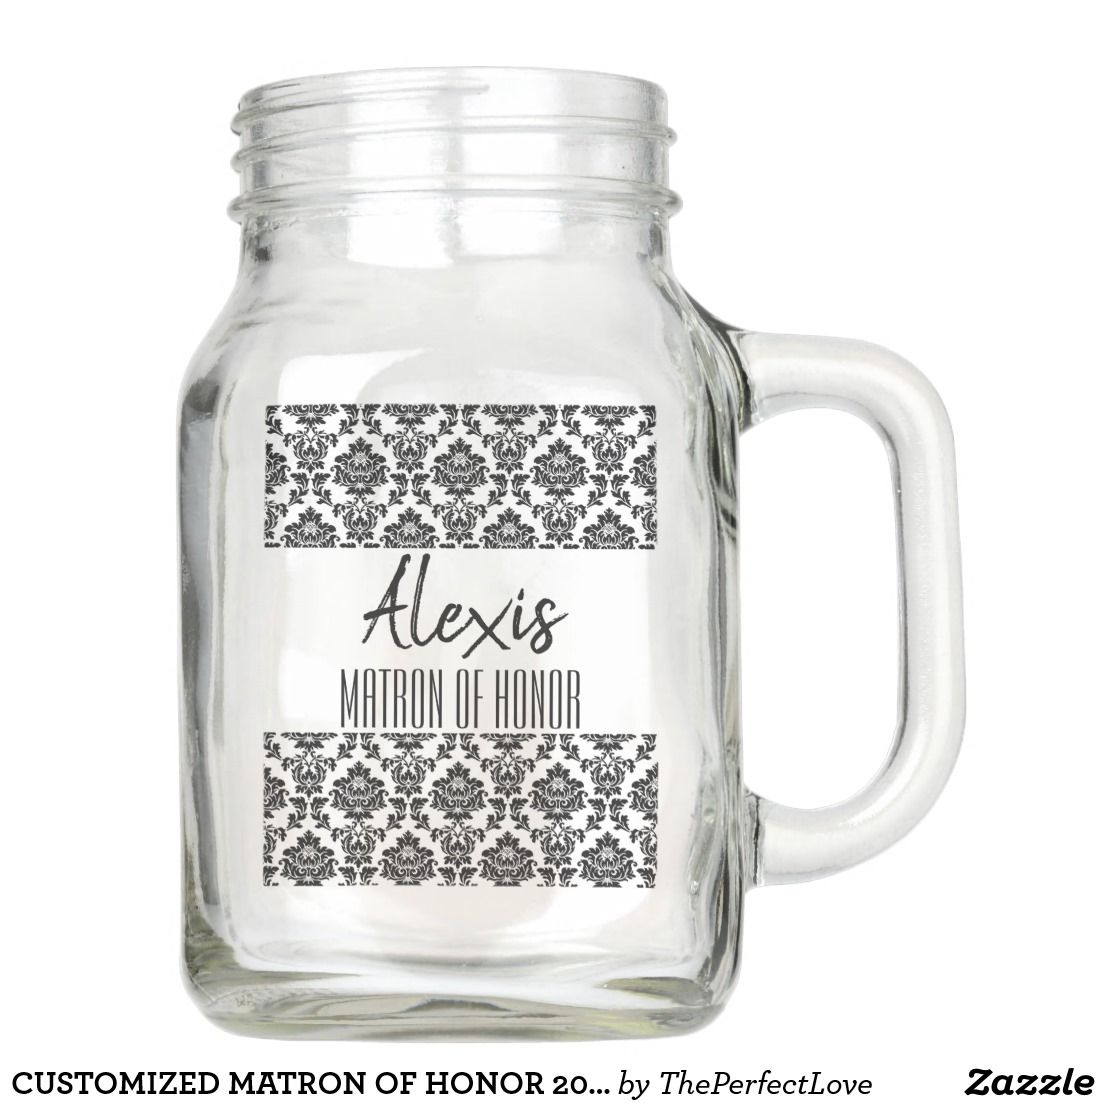 Customized matron of honor 20 oz mason jar be my